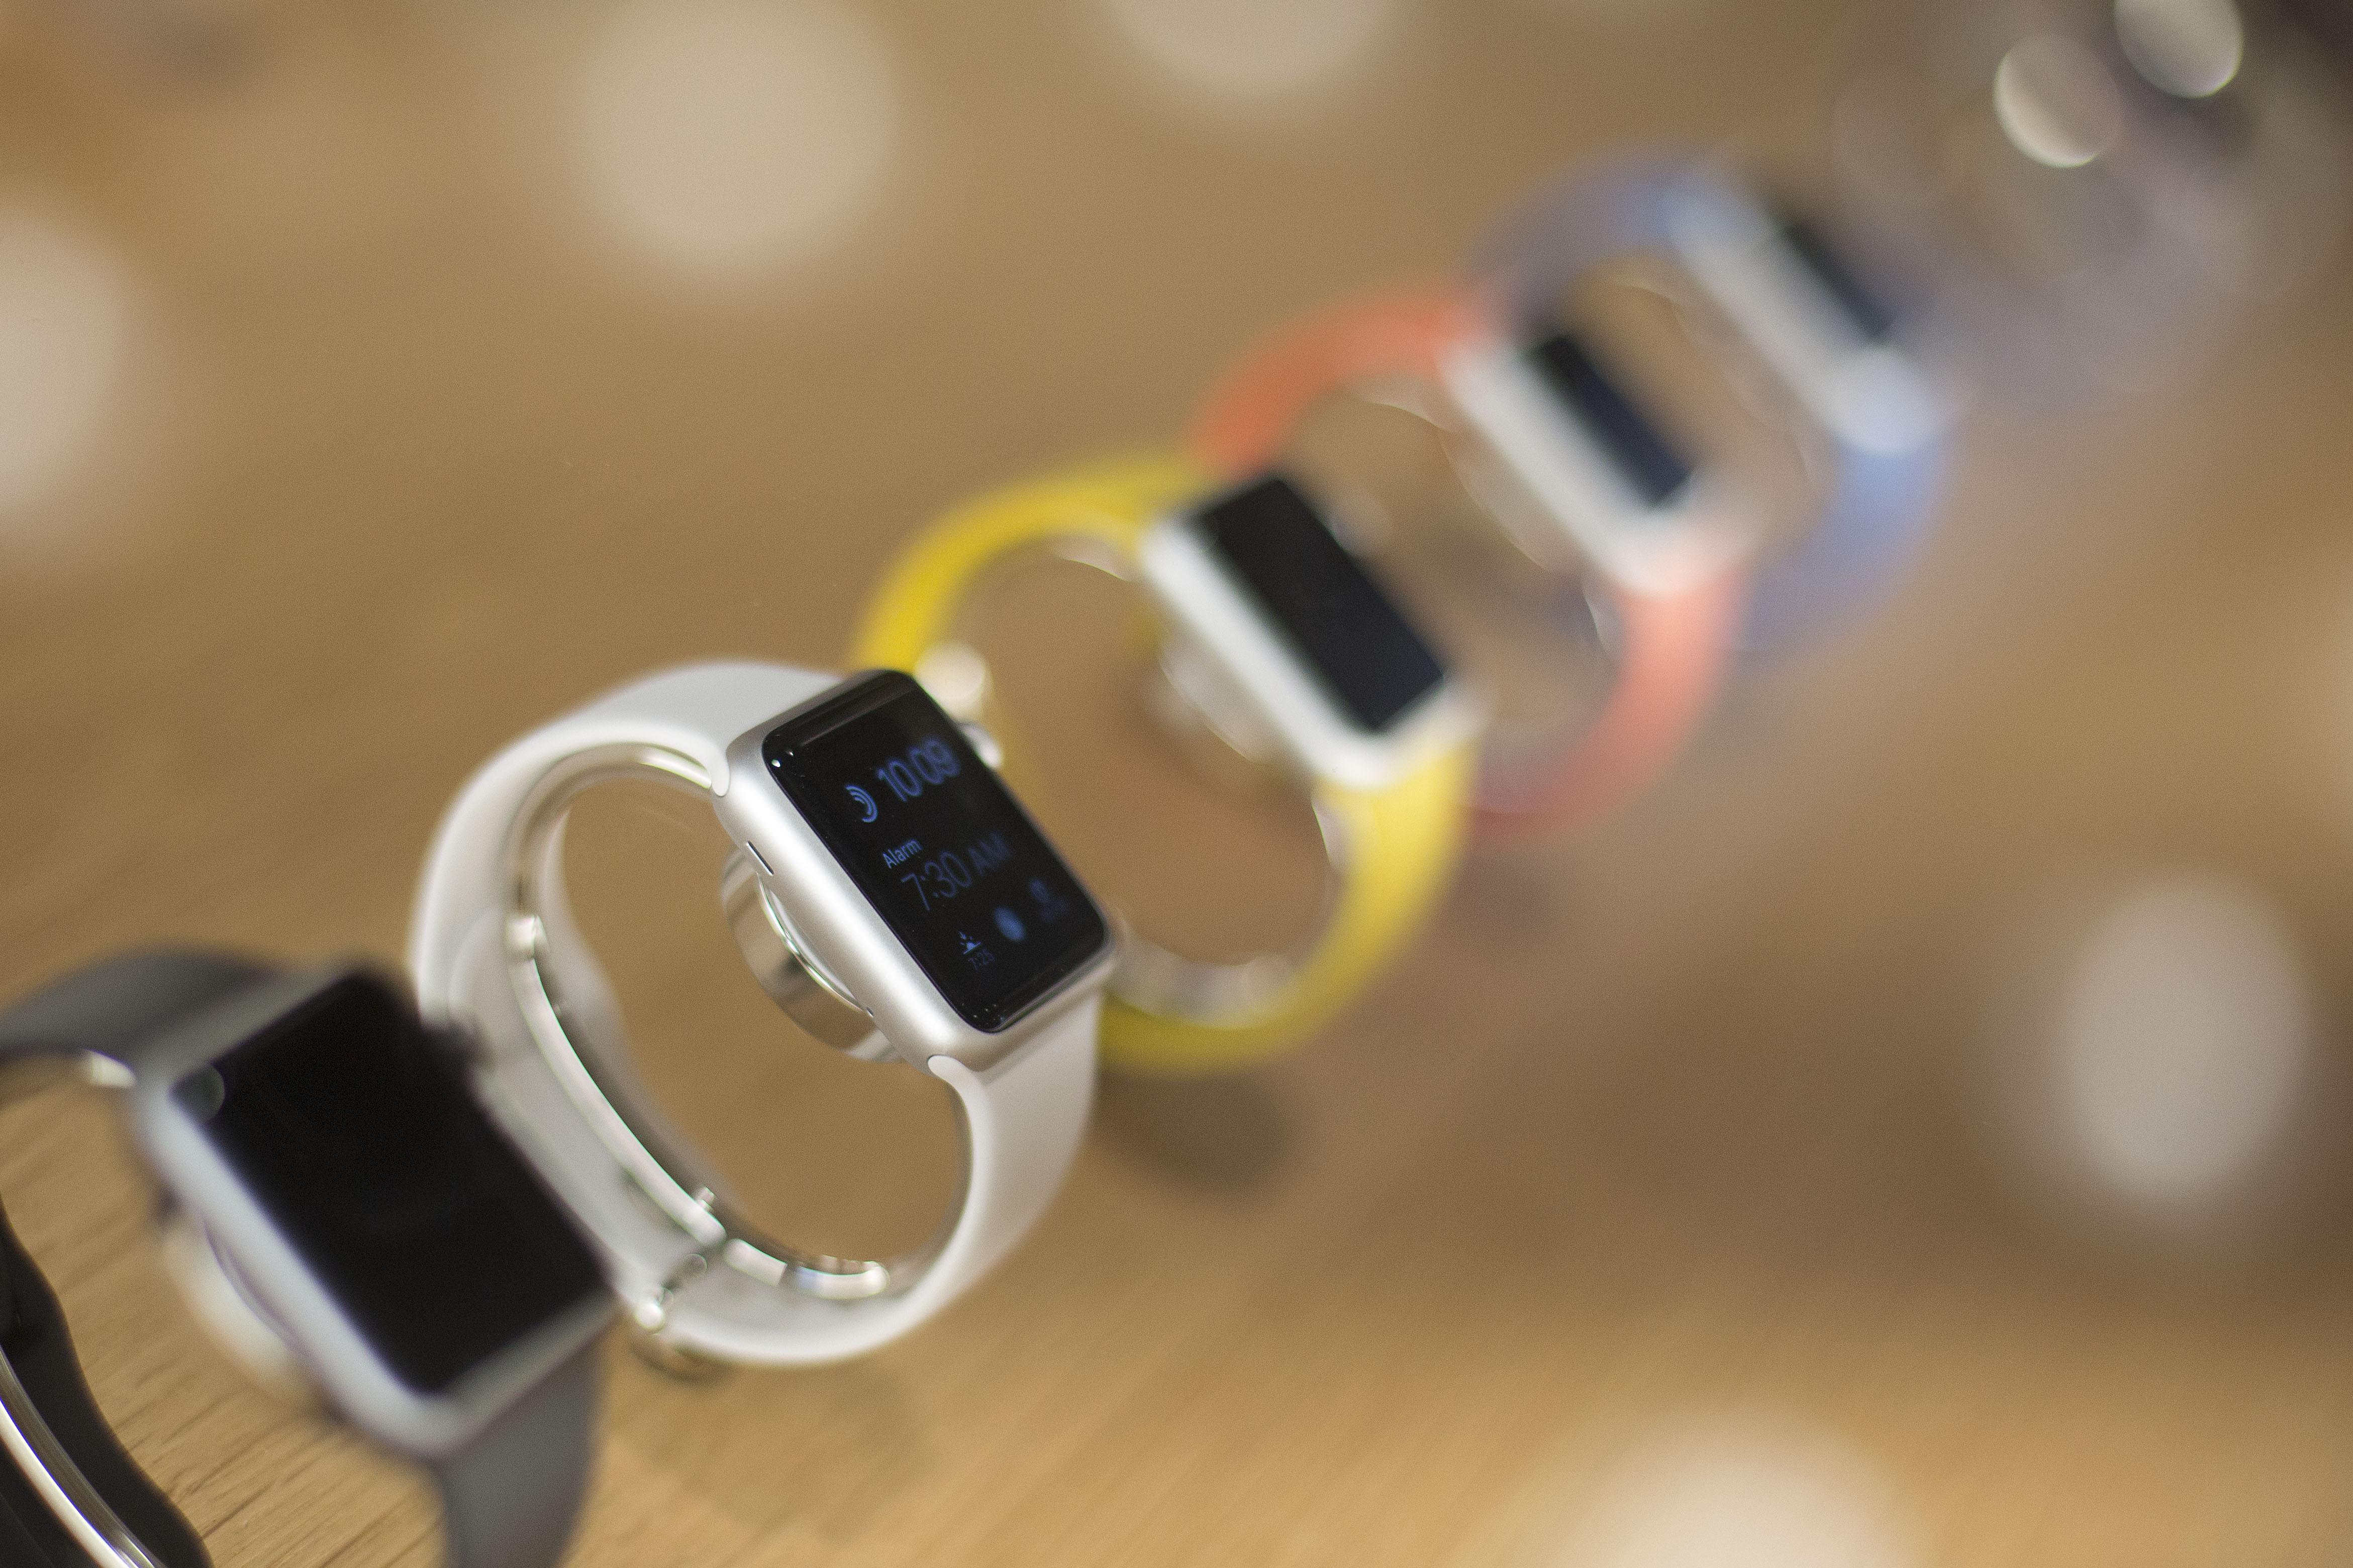 Apple apple watch tim cook smartwatch